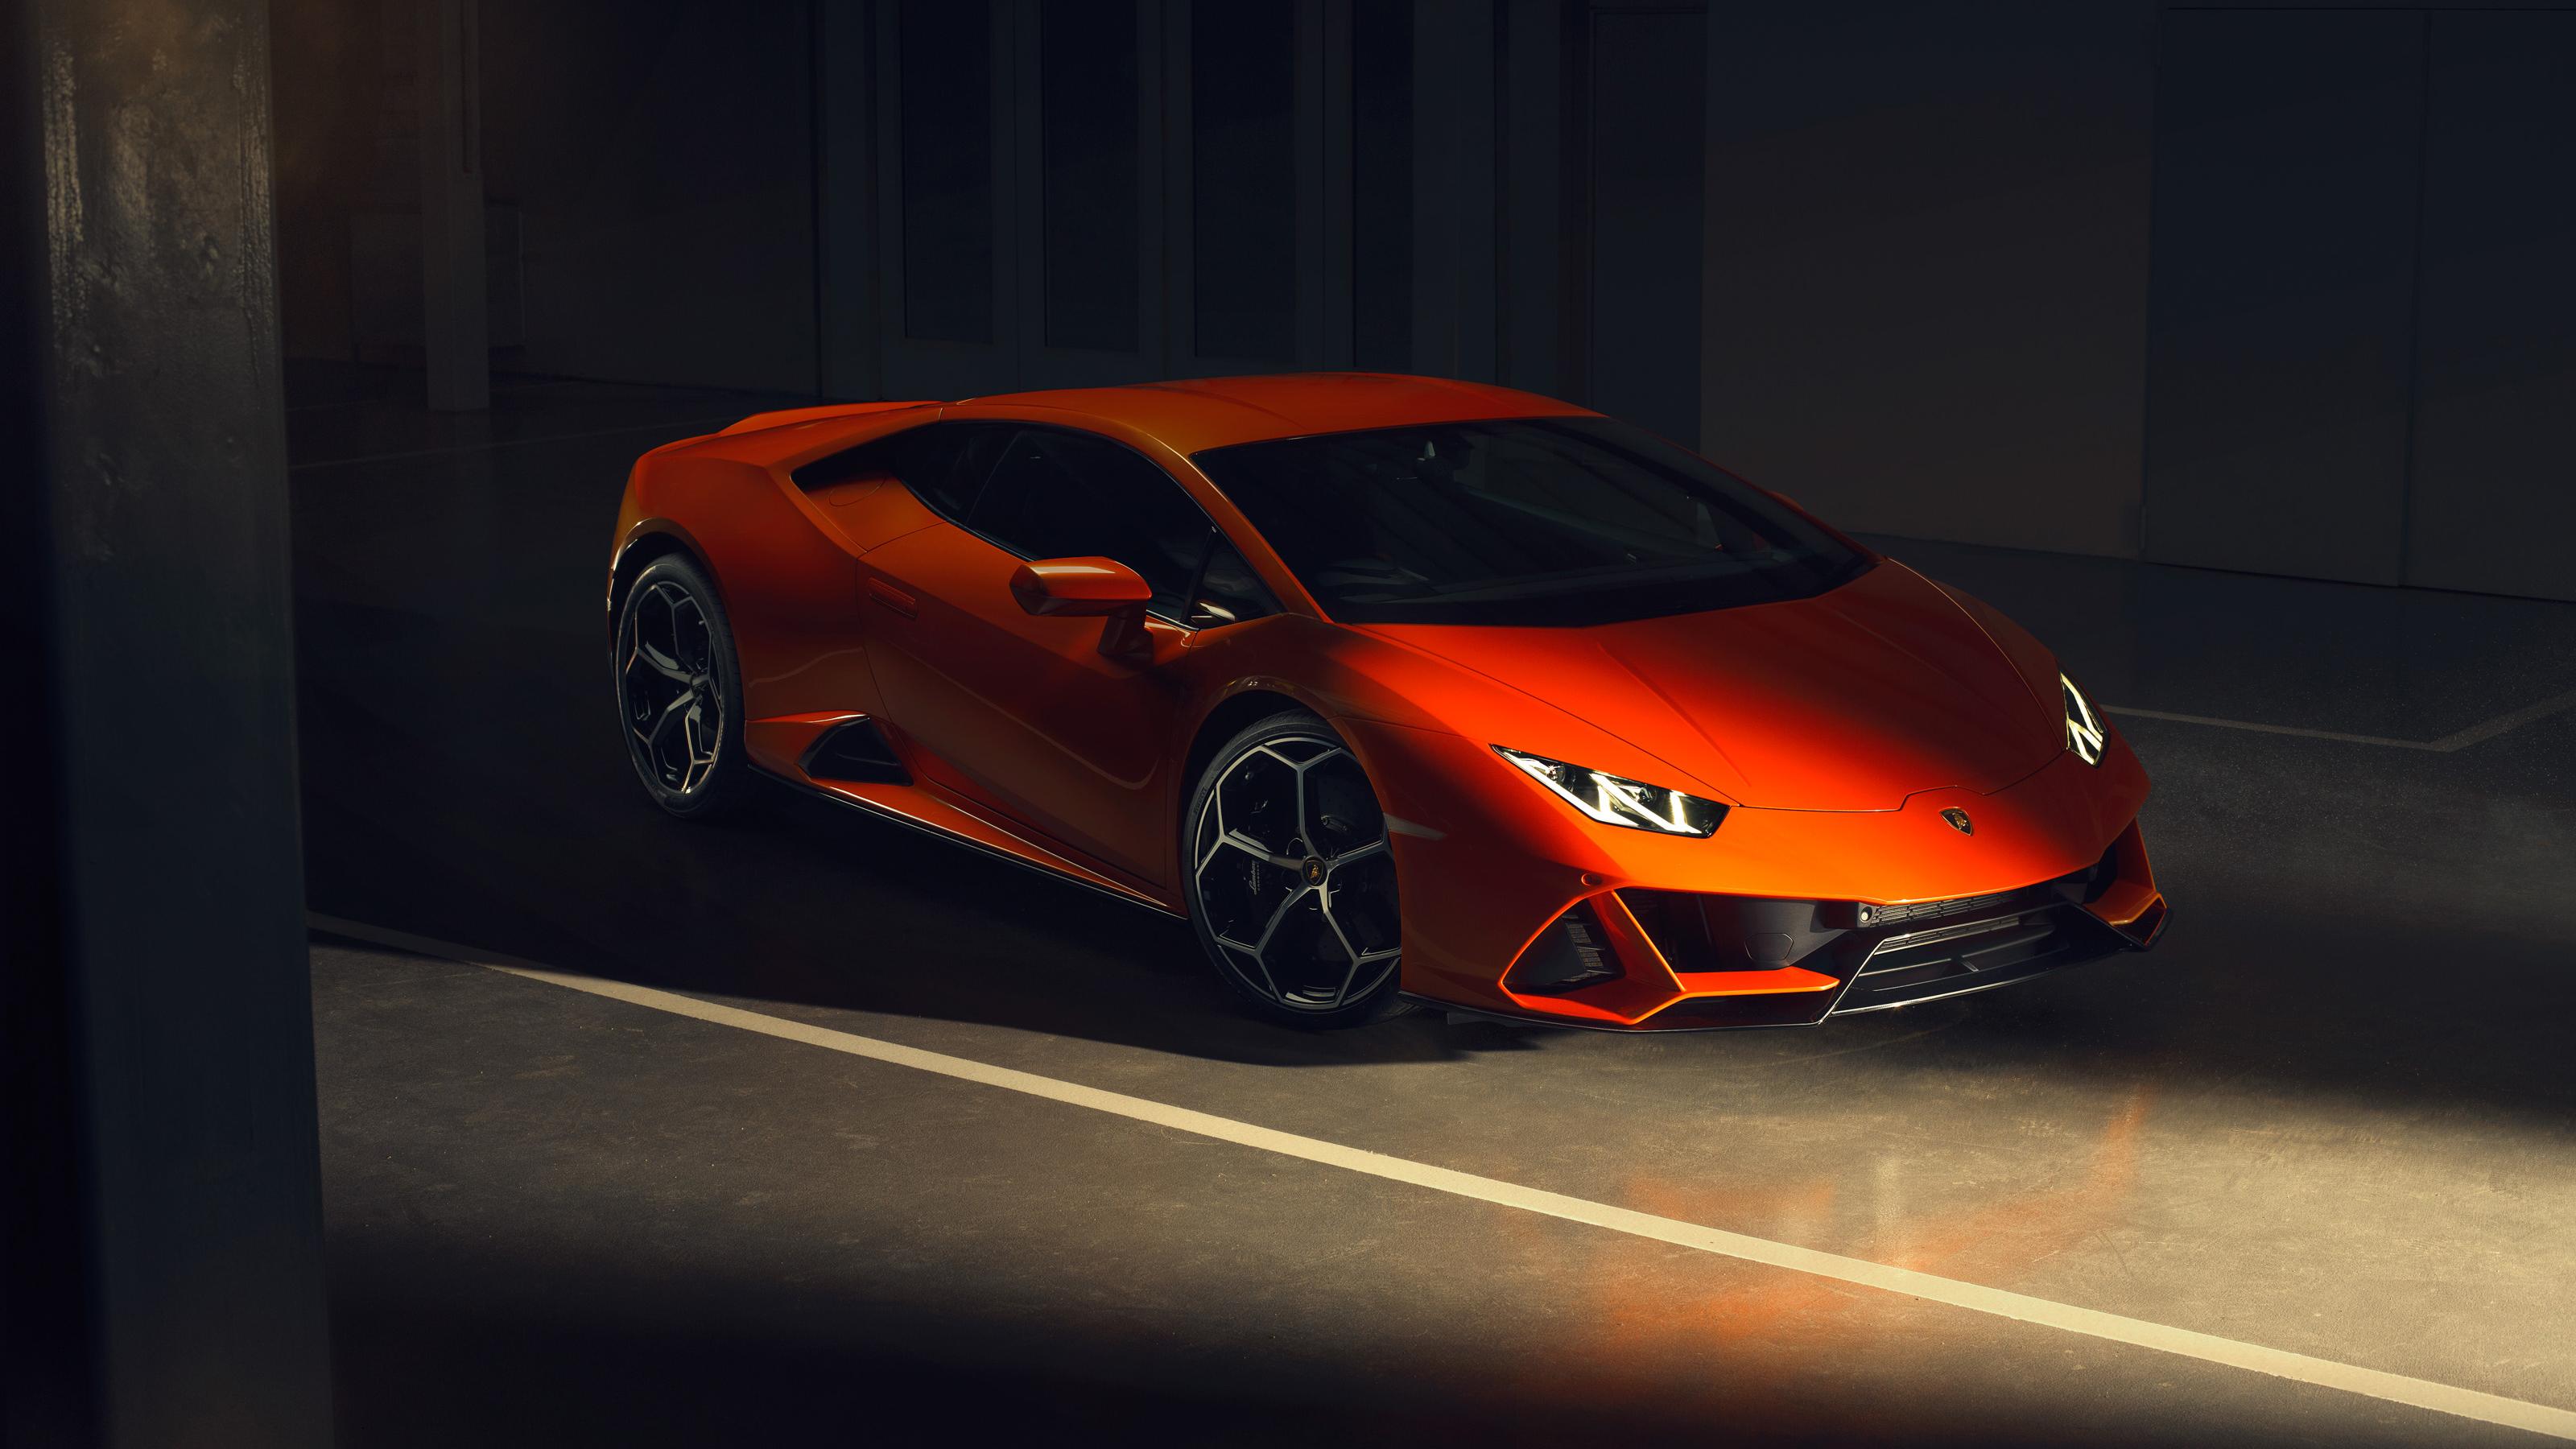 Lamborghini Huracan Evo 2019 4k Wallpaper Hd Car Wallpapers Id